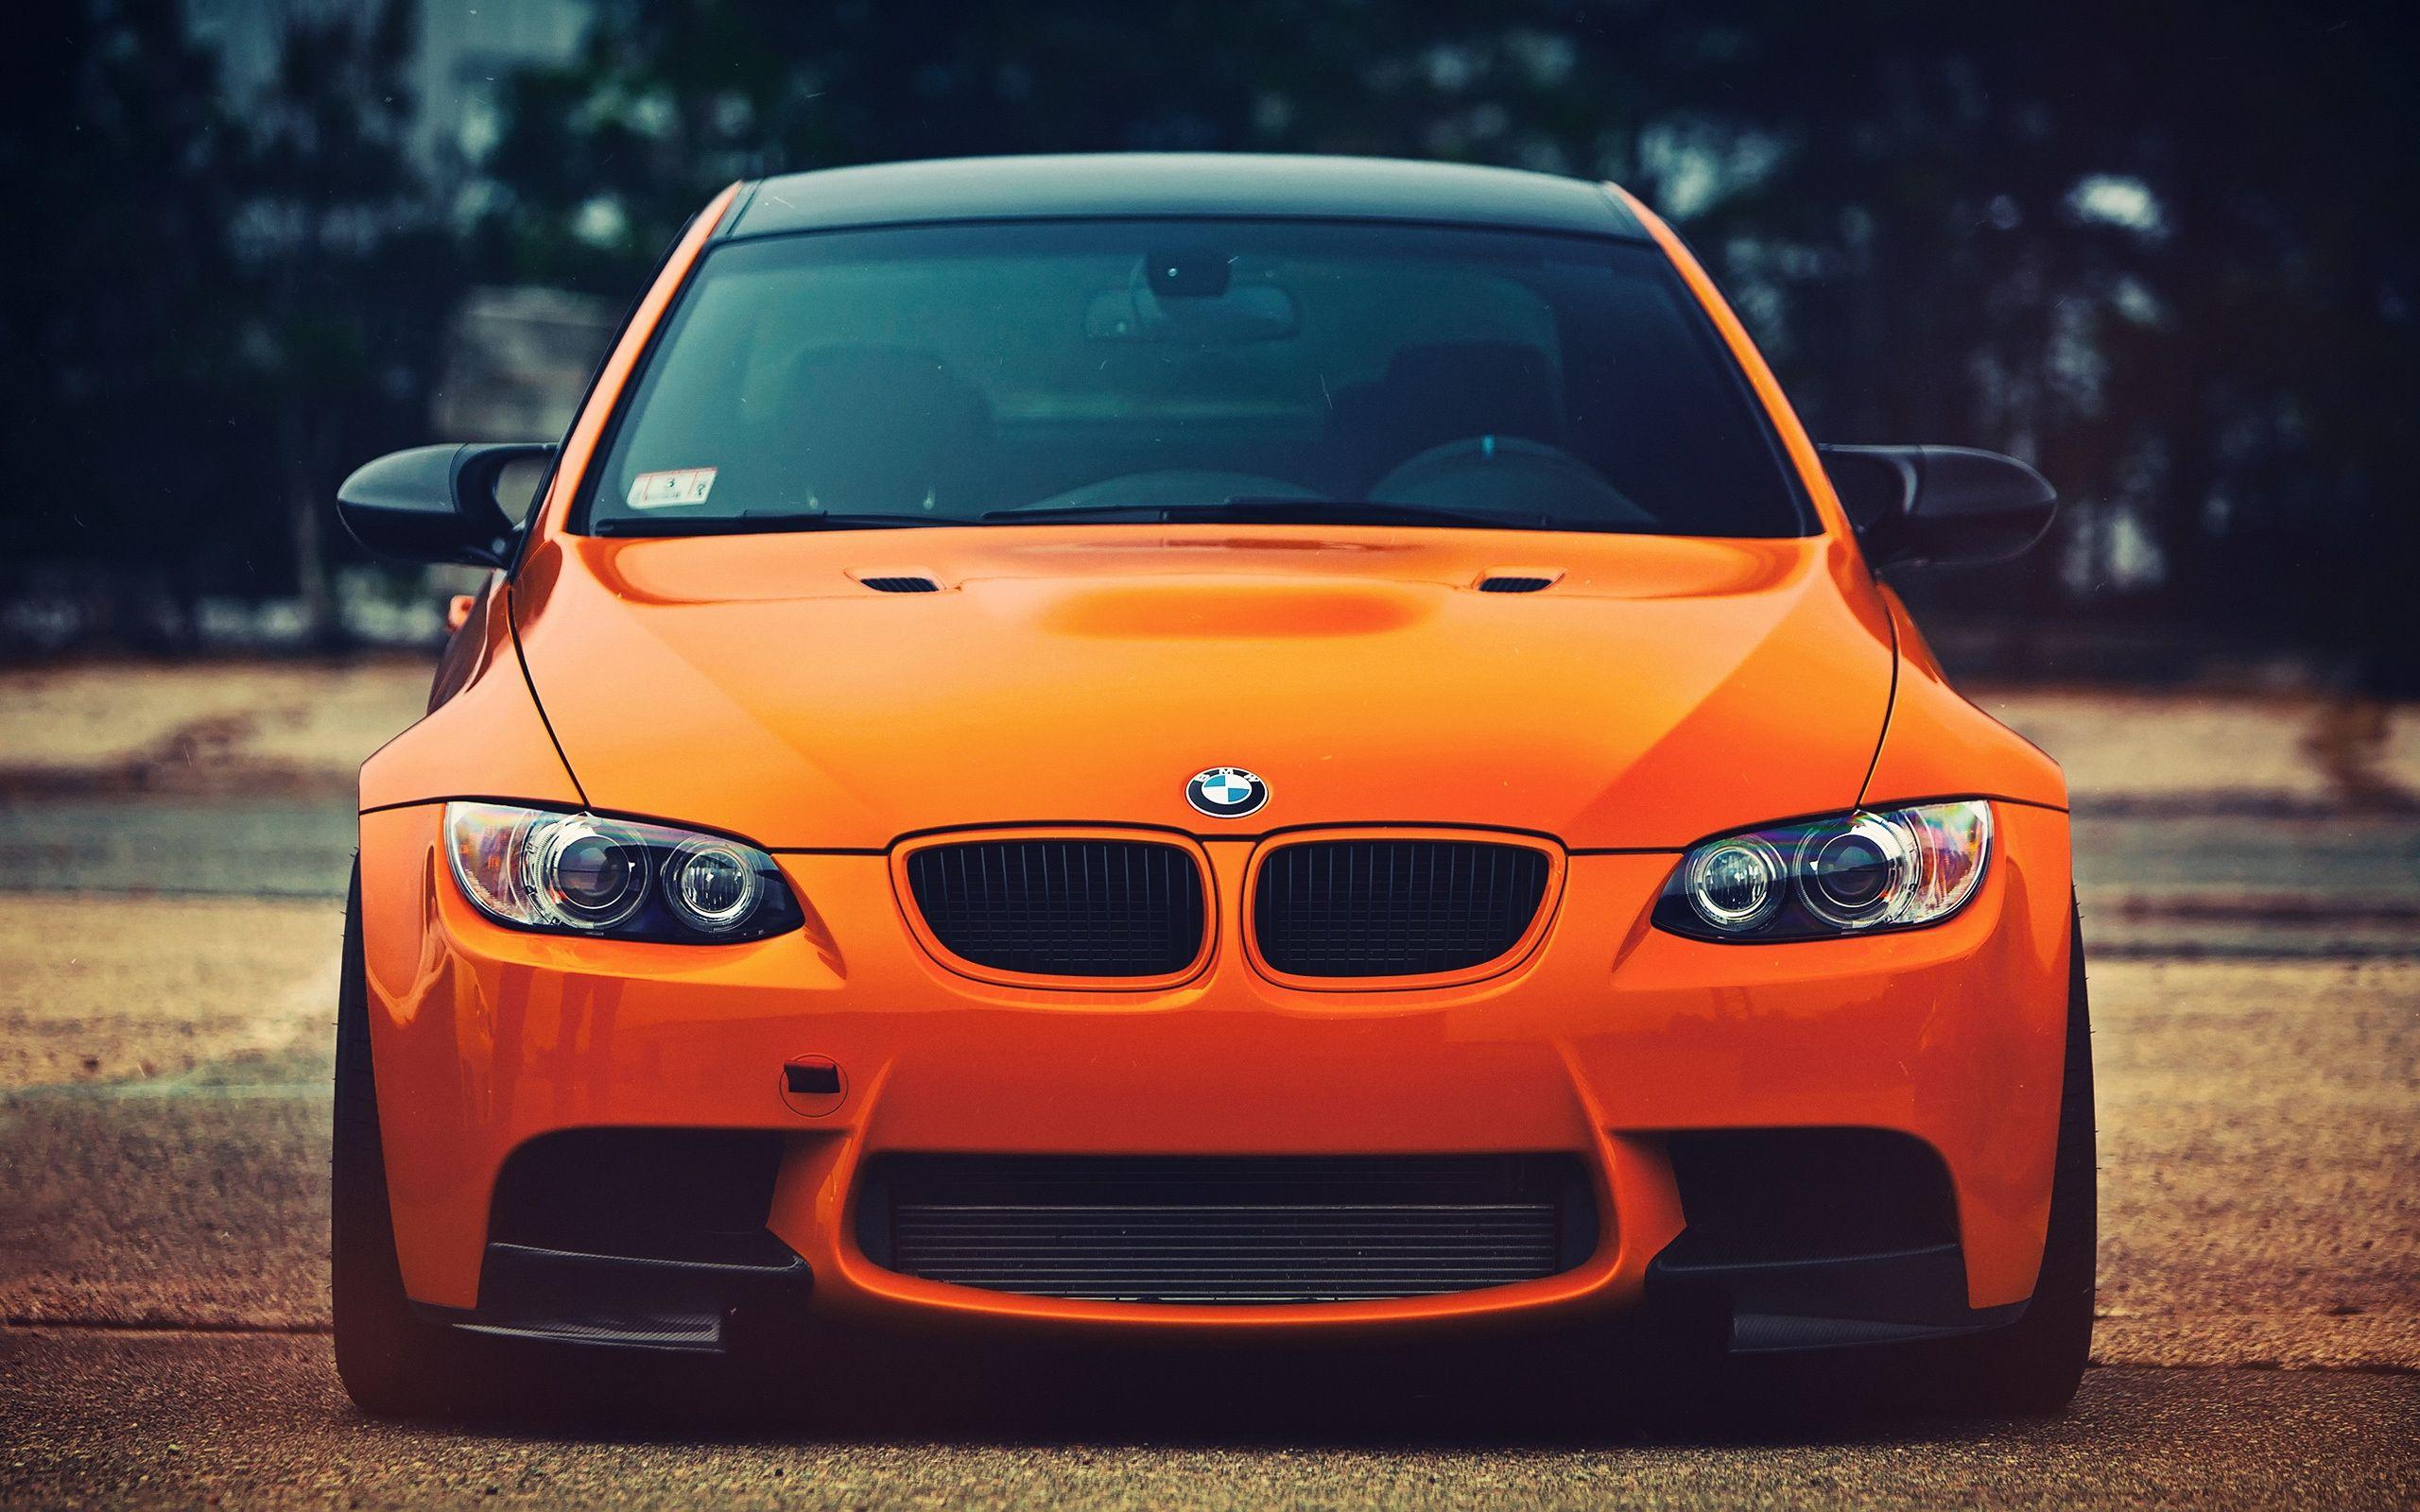 Bmw M3 Orange Car Front View Wallpapers Hd Desktop Wallpaper